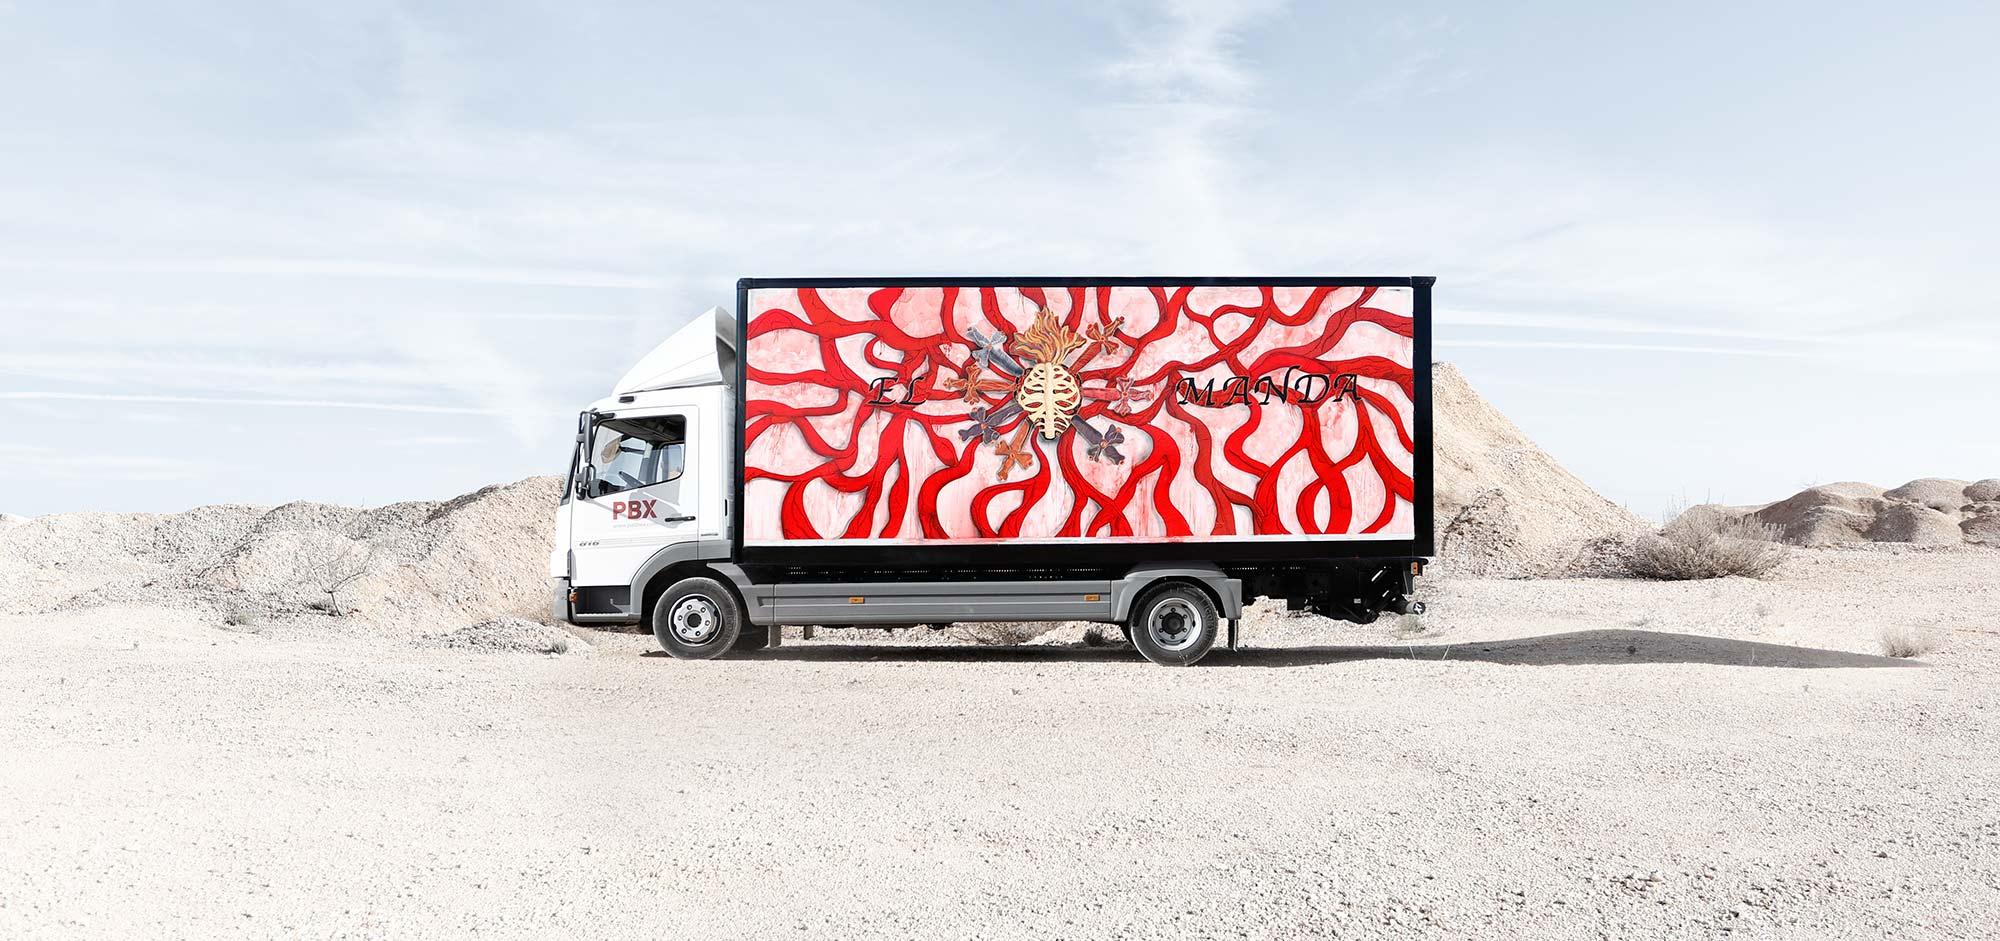 MARINA VARGAS - TRUCK ART PROJECT - 2